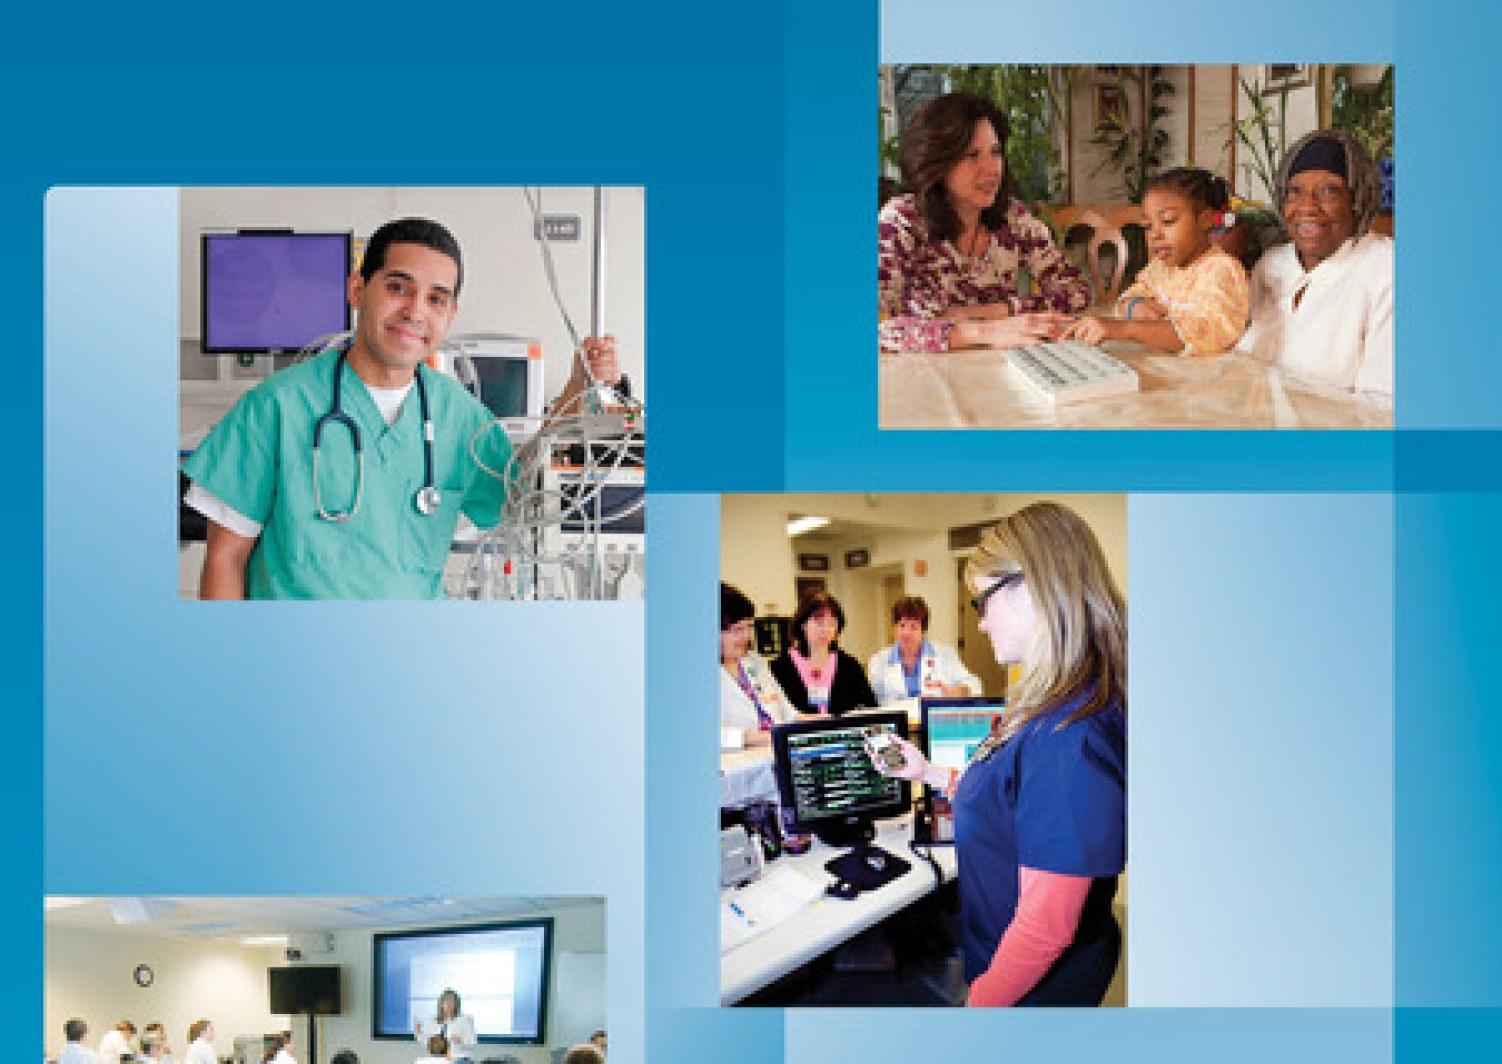 5 Transforming Leadership The Future Of Nursing Leading Change Advancing Health The National Academies Press